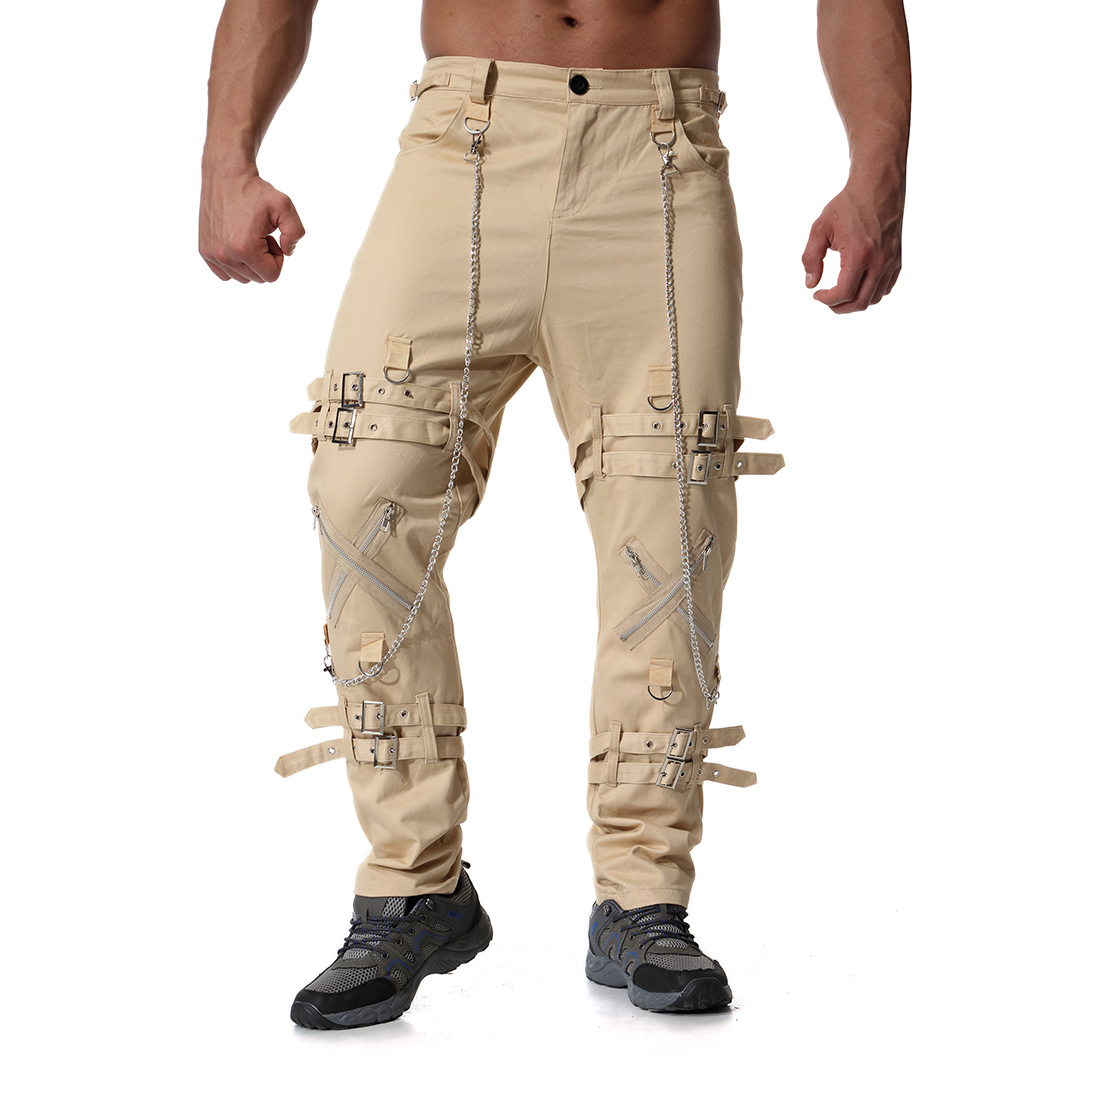 Pantalones para hombre, pantalones de chándal, pantalones de chándal, pantalones para hombre, hip hop, Camuflaje, pantalones tácticos de carga, Militar - 5